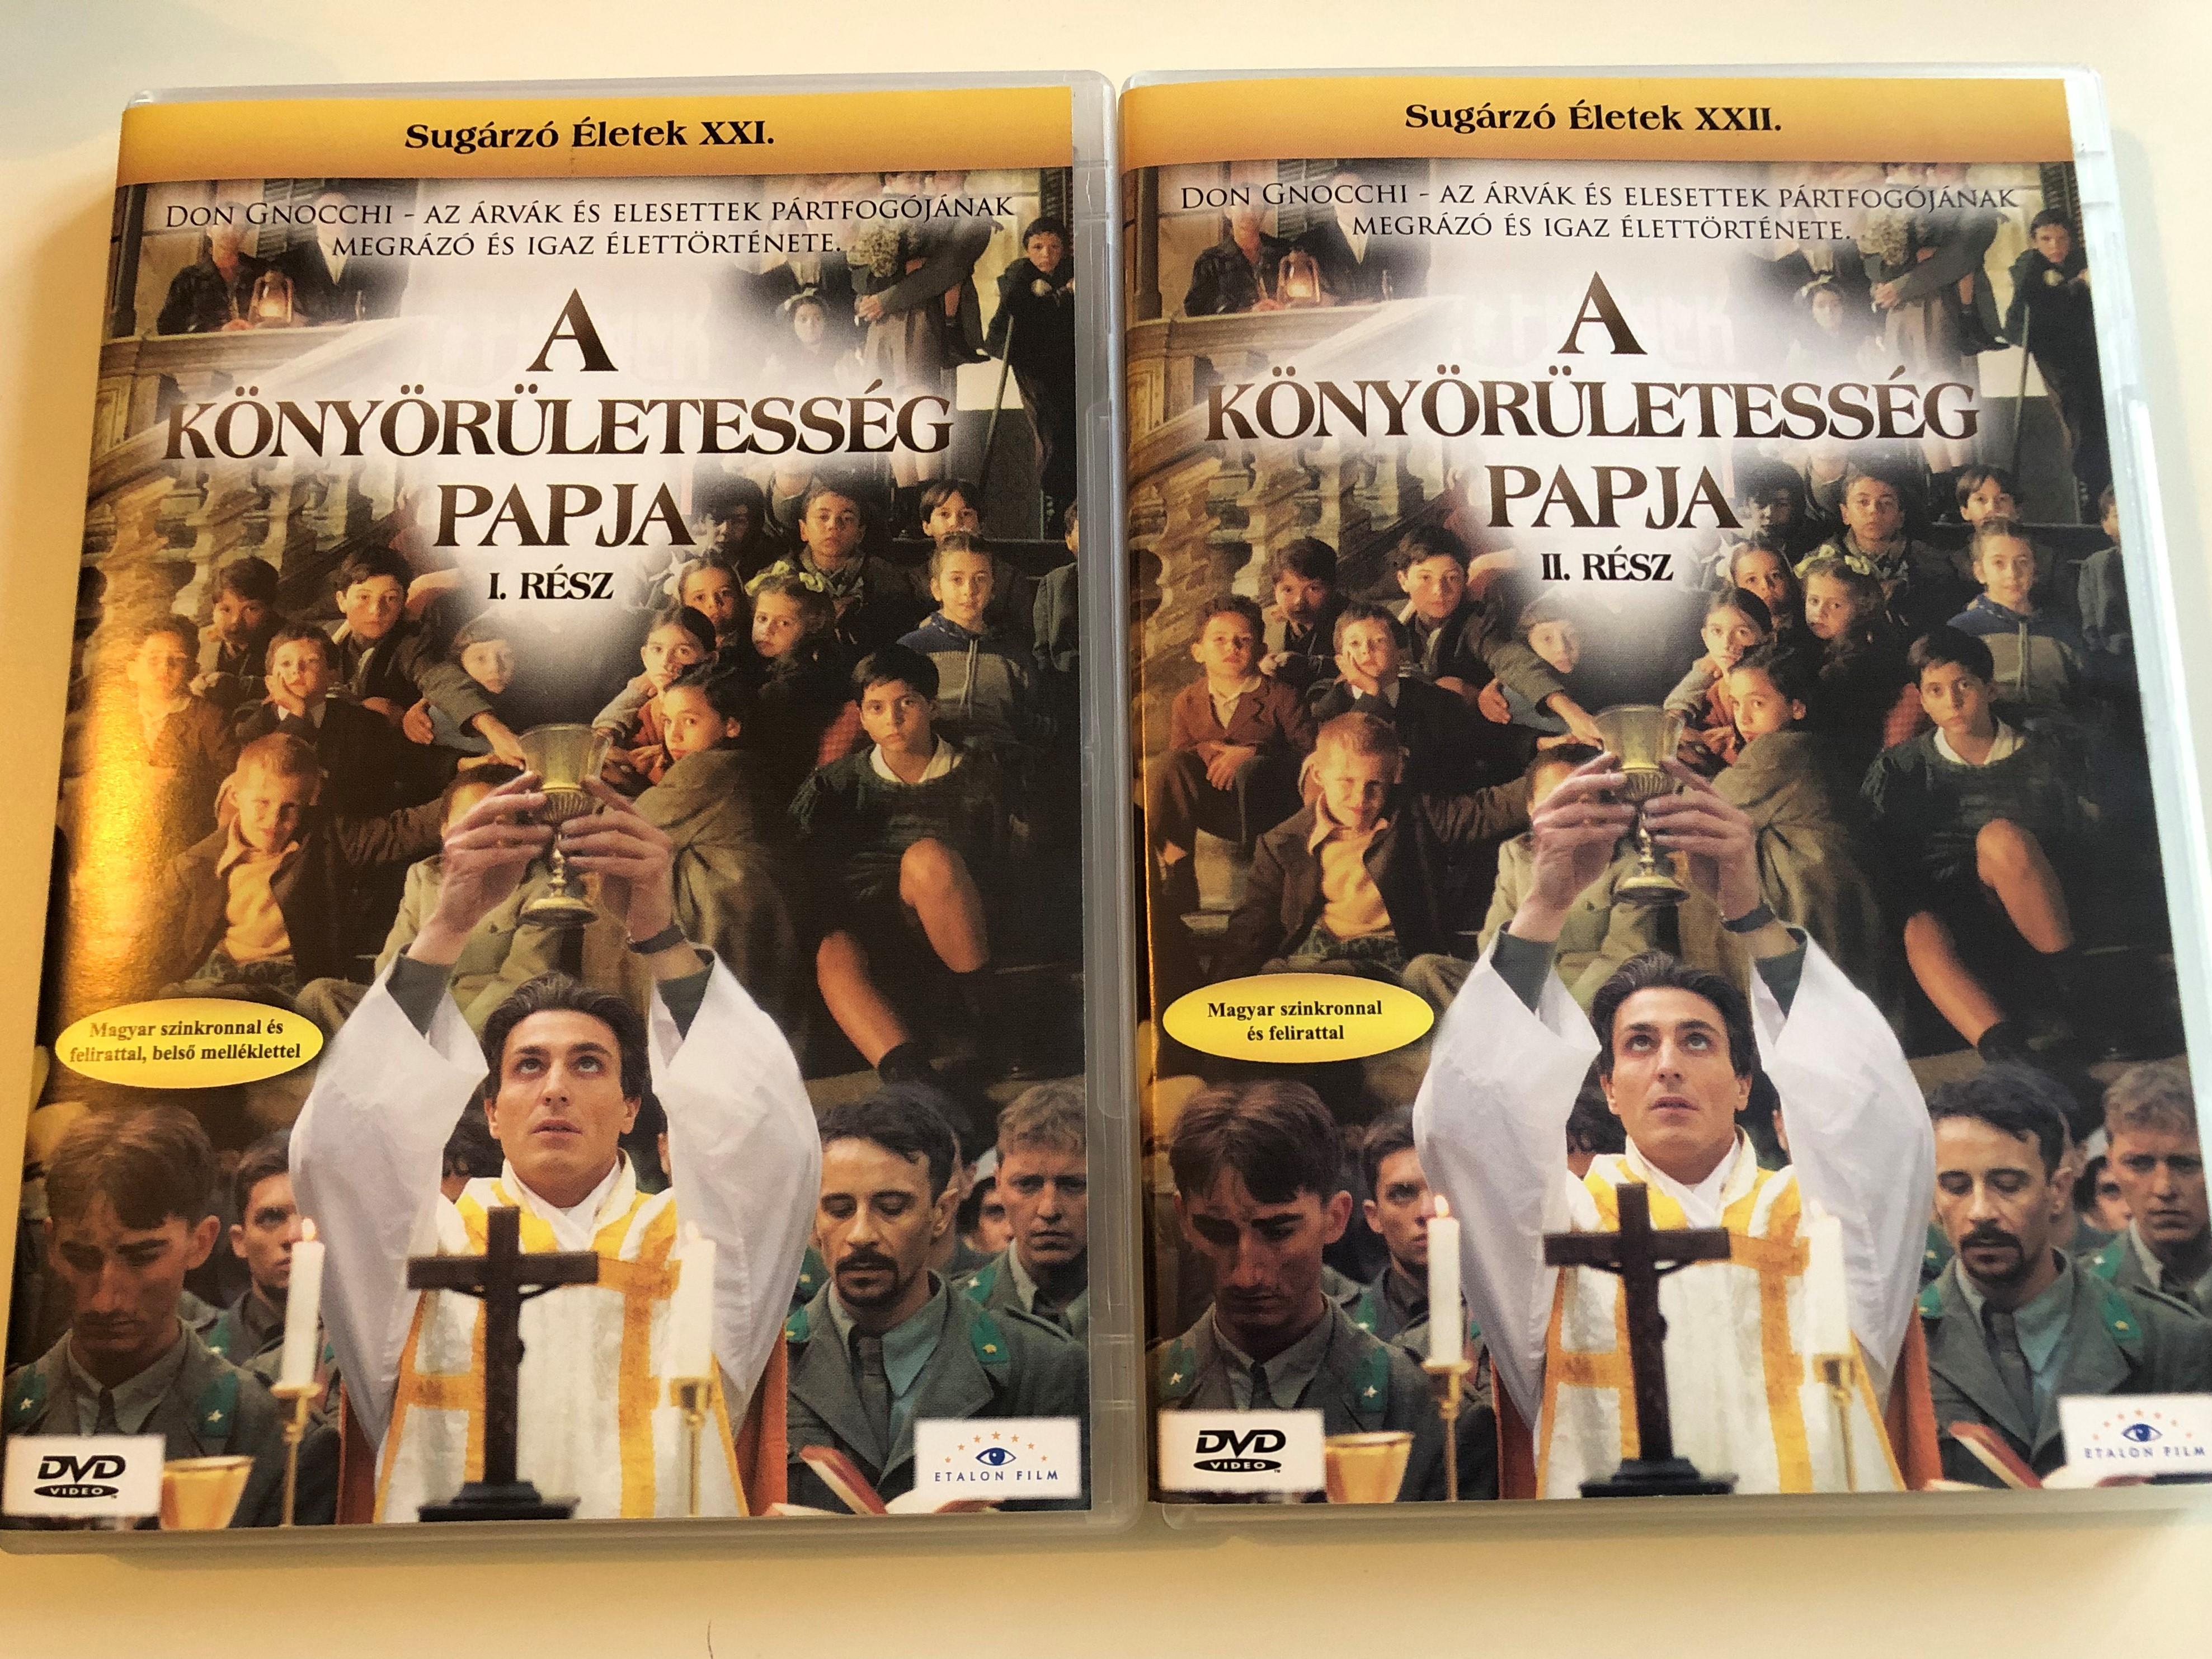 don-gnocchi-l-angelo-dei-bimbi-dvd-set-father-of-mercy-dvd-2004-a-k-ny-r-letess-g-papja-1-2-.r-sz-directed-by-cinzia-th-torrini-starring-daniele-liotti-giulio-pampiglione-francesco-martino-sug-rz-letek-xxi-xxii-1-.jpg